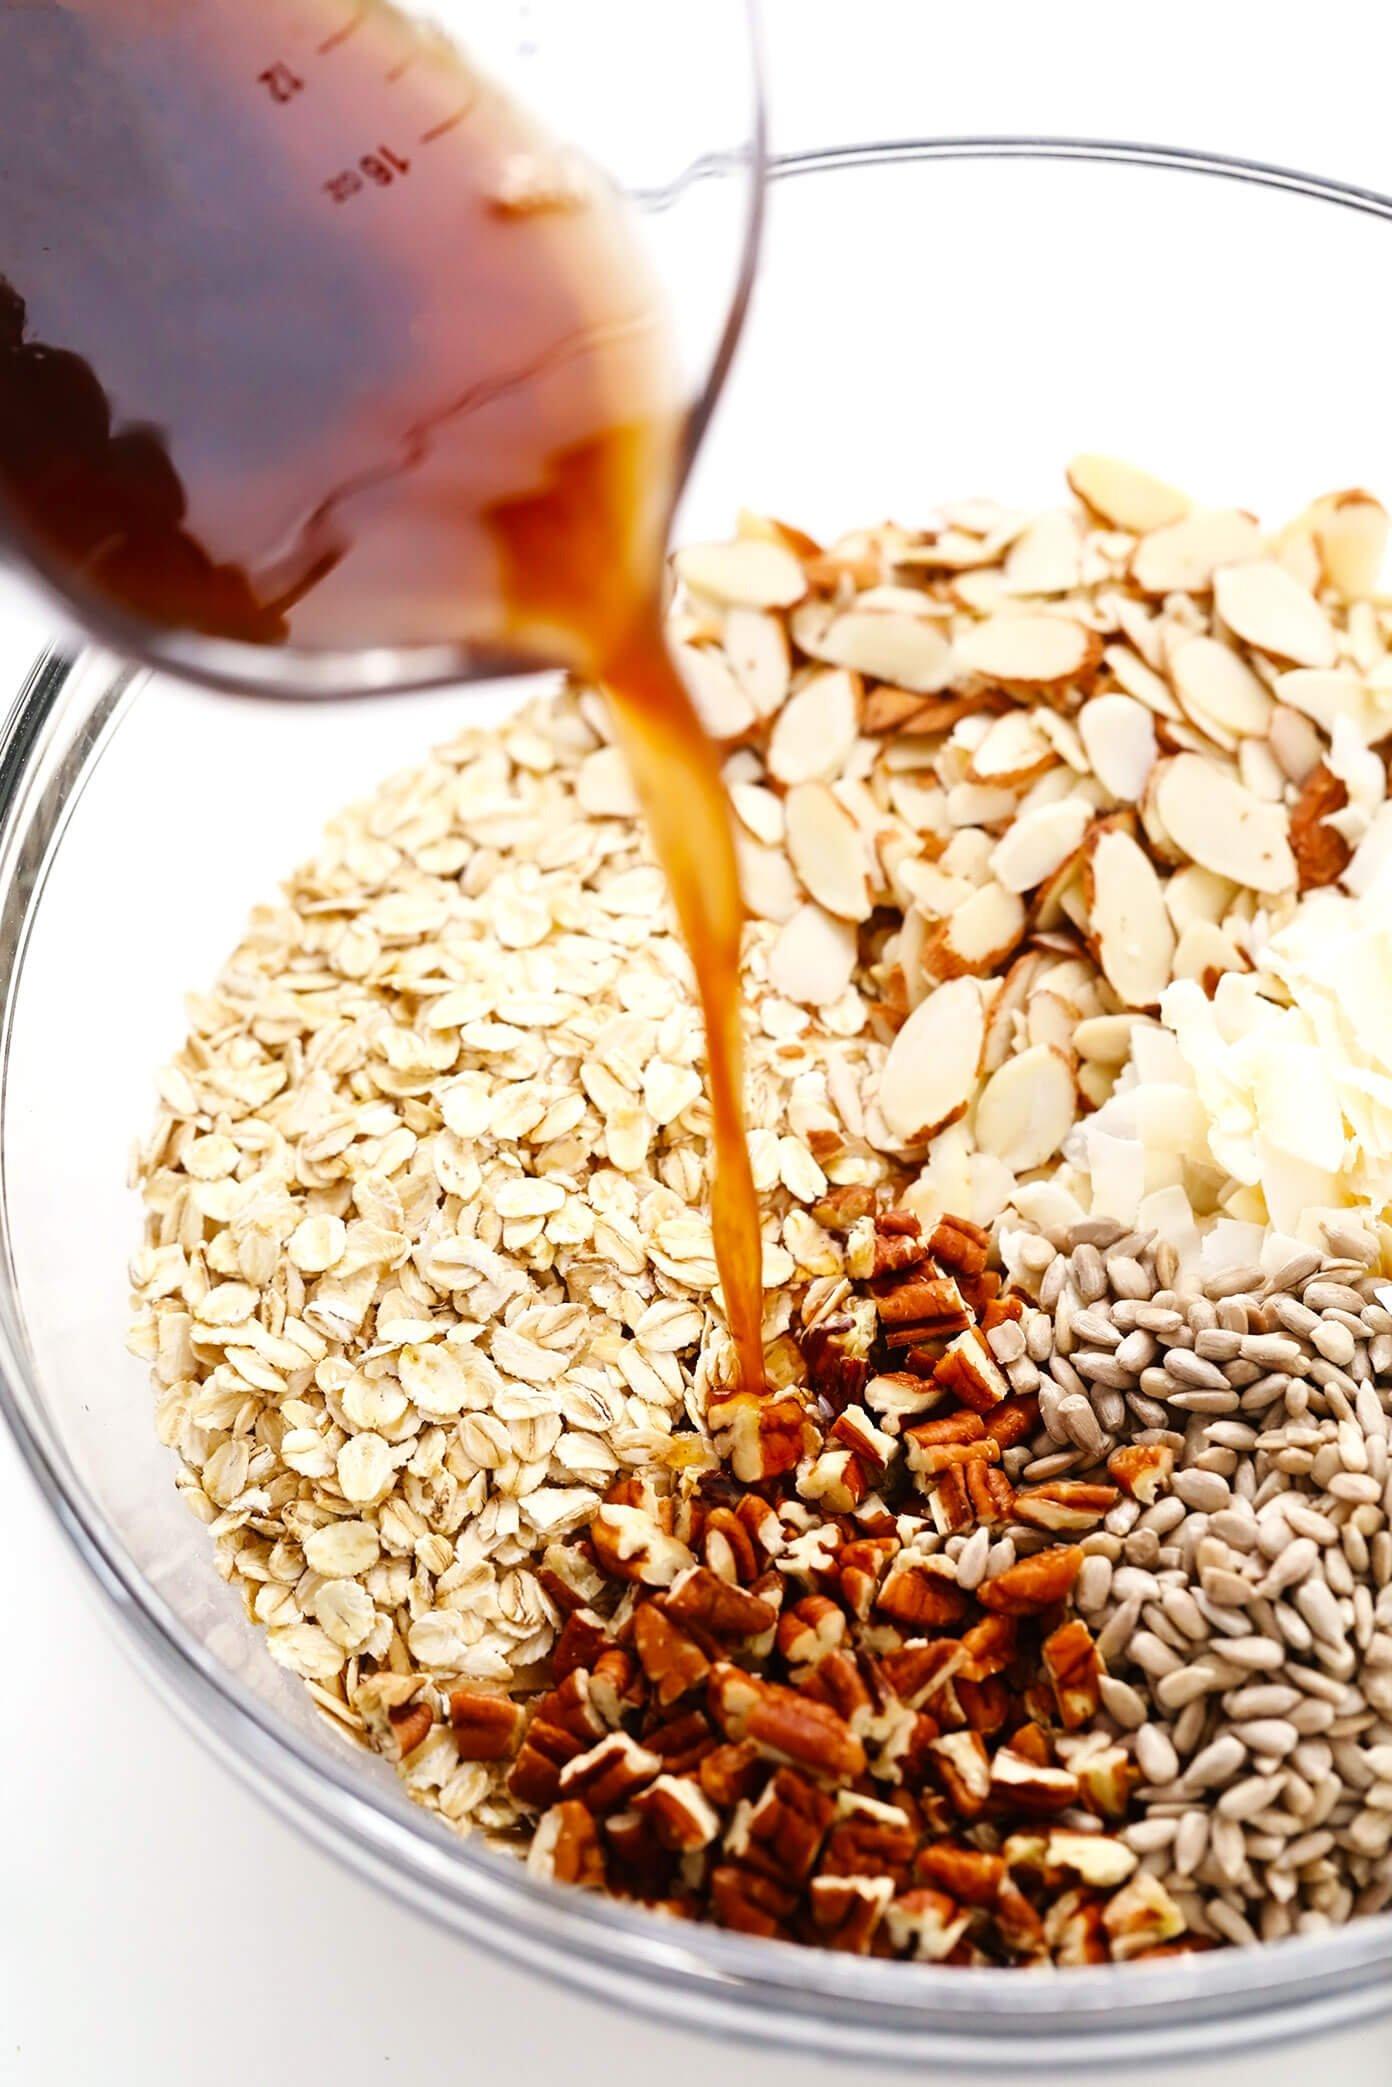 Granola Ingredients in Bowl